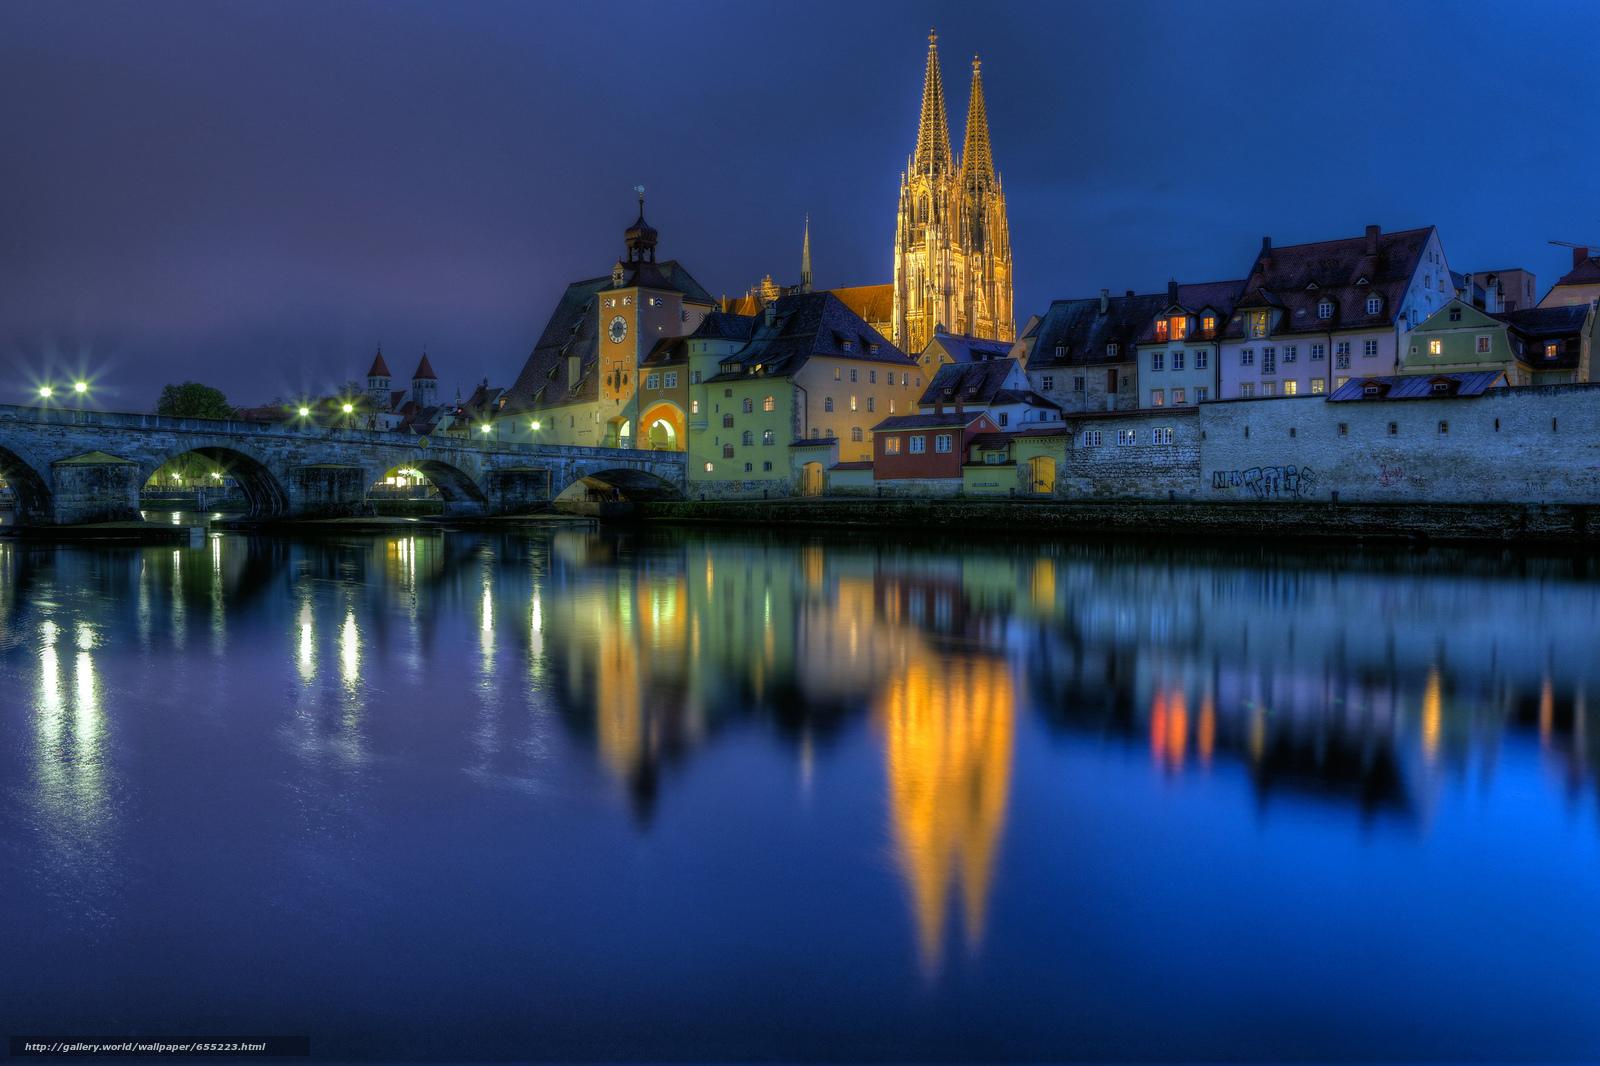 Download wallpaper Regensburg,  Regensburg,  Germany,  Bayern free desktop wallpaper in the resolution 2048x1365 — picture №655223